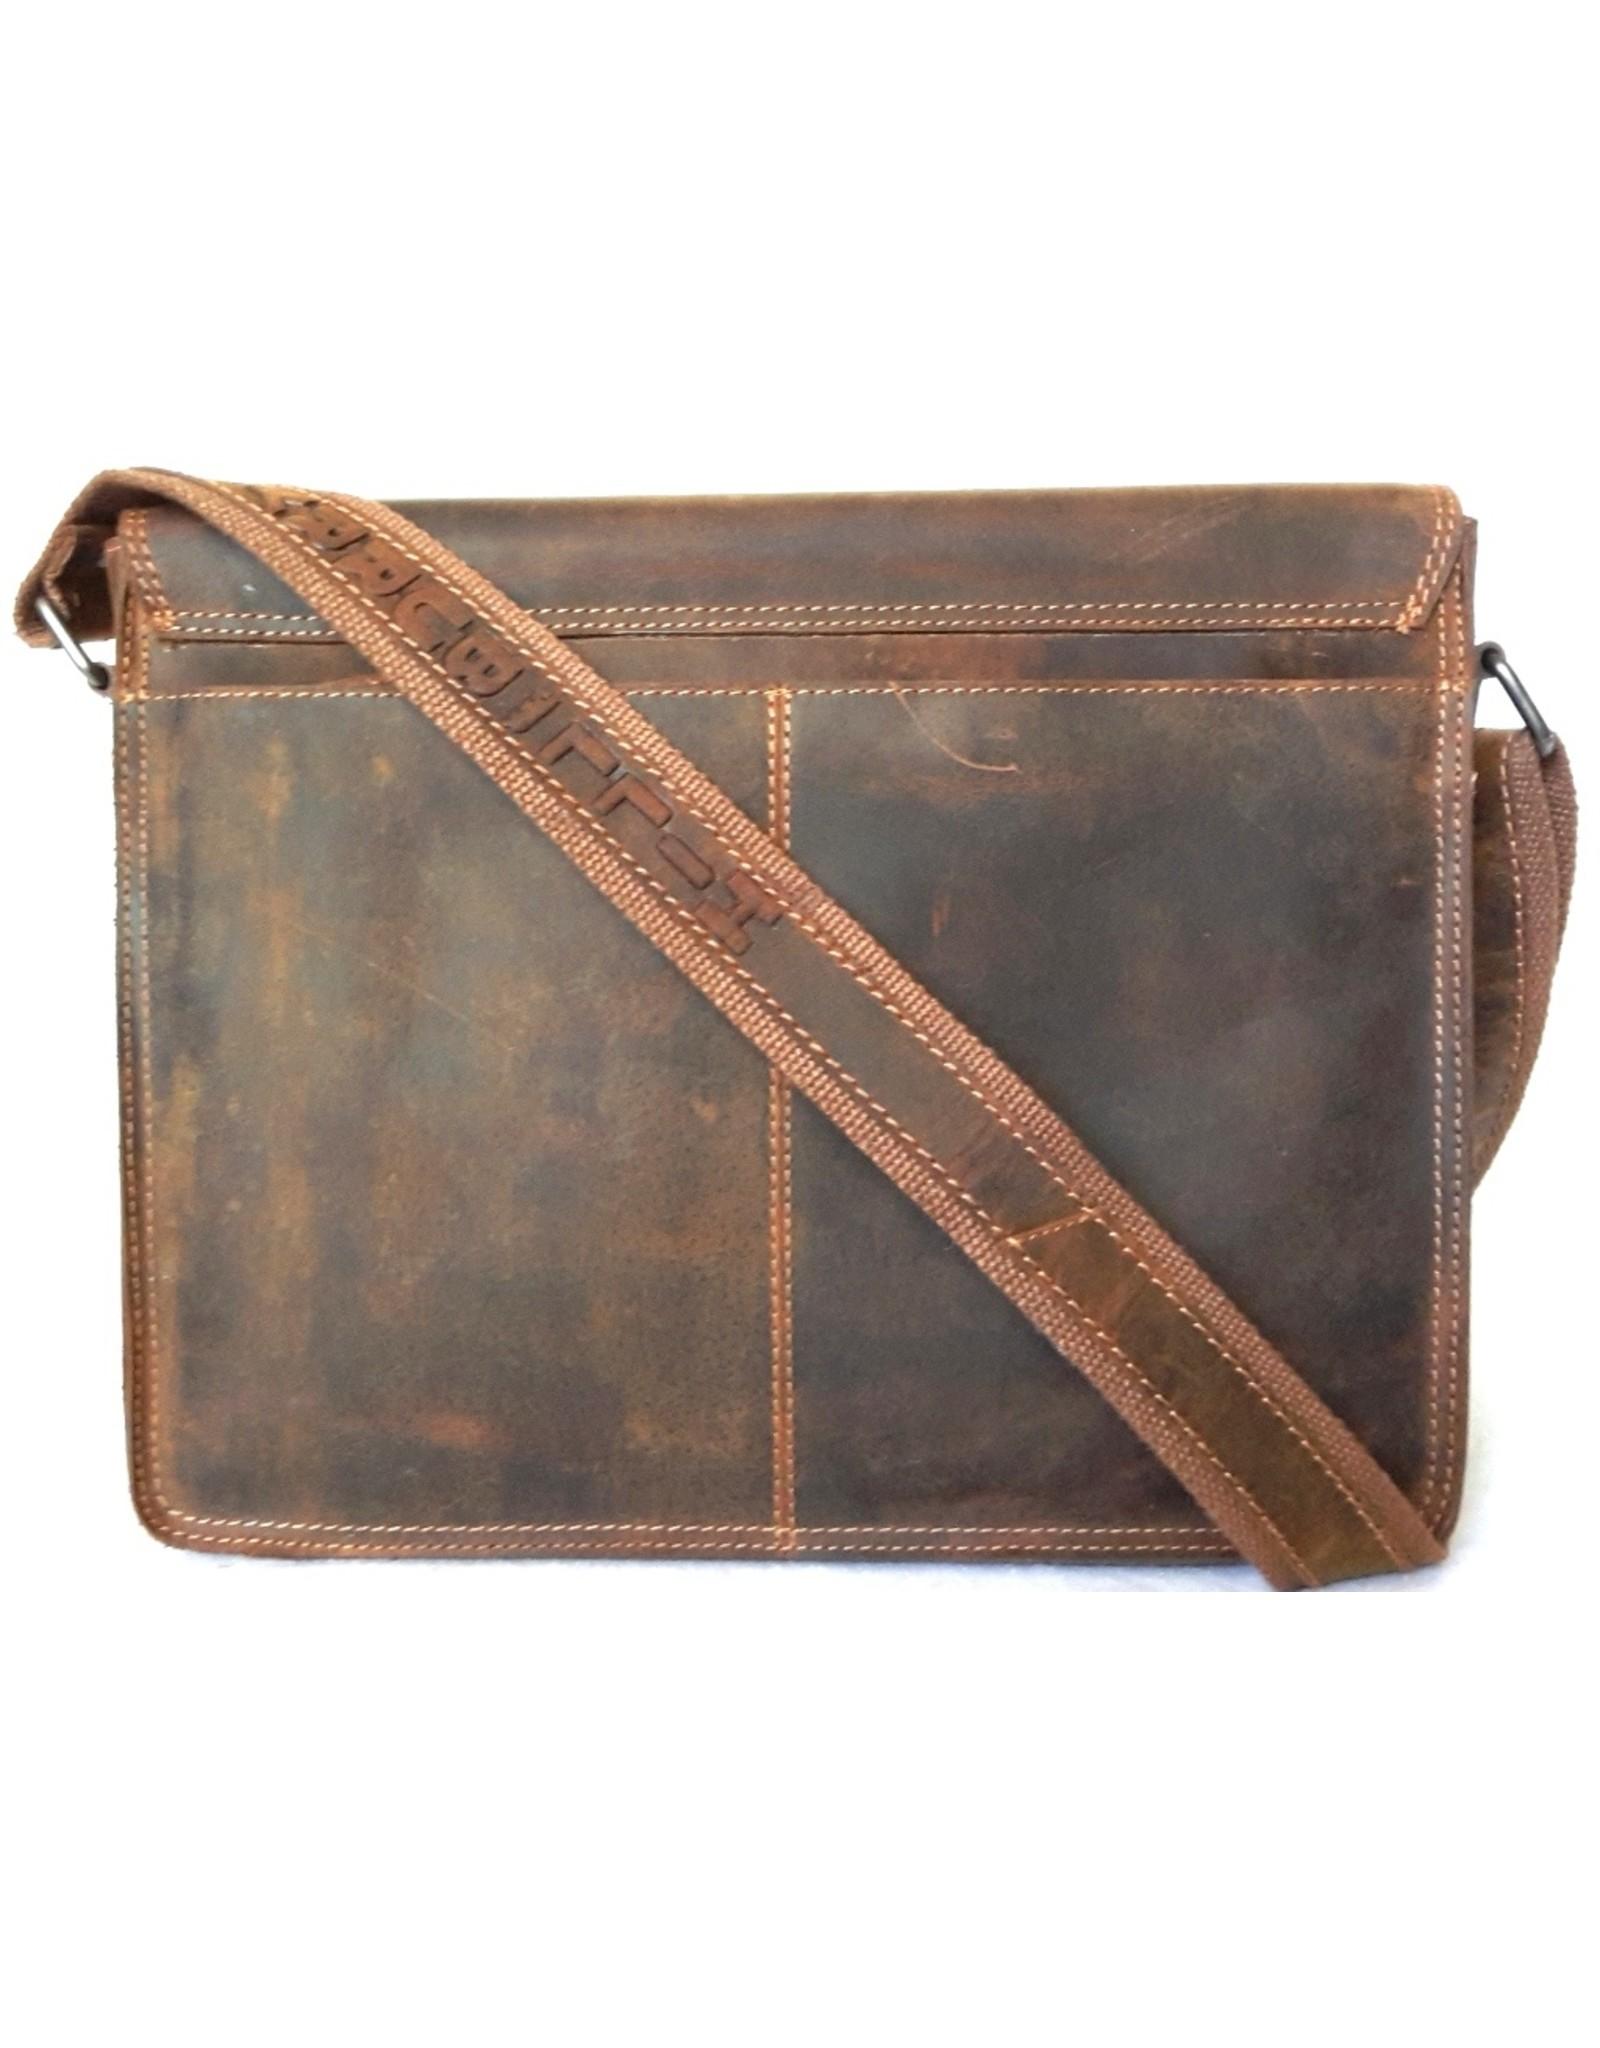 HillBurry Leather work bags Leather laptop bags - Hillburry Leather school bag vintage look Mango tan (large)